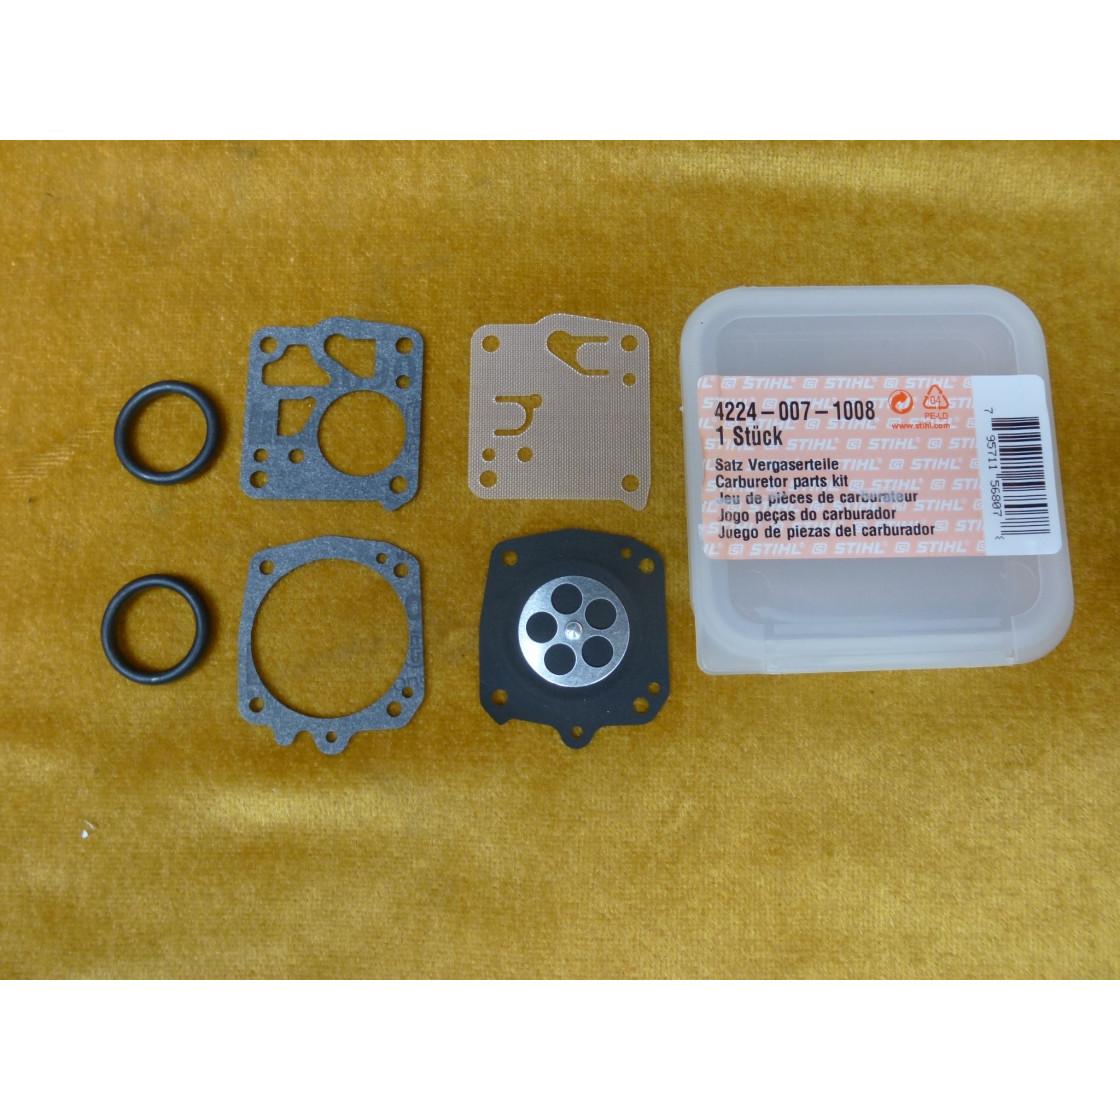 NEU Original Stihl 10x Schraube T27 IS-M6x35-10,9 9022 341 1380